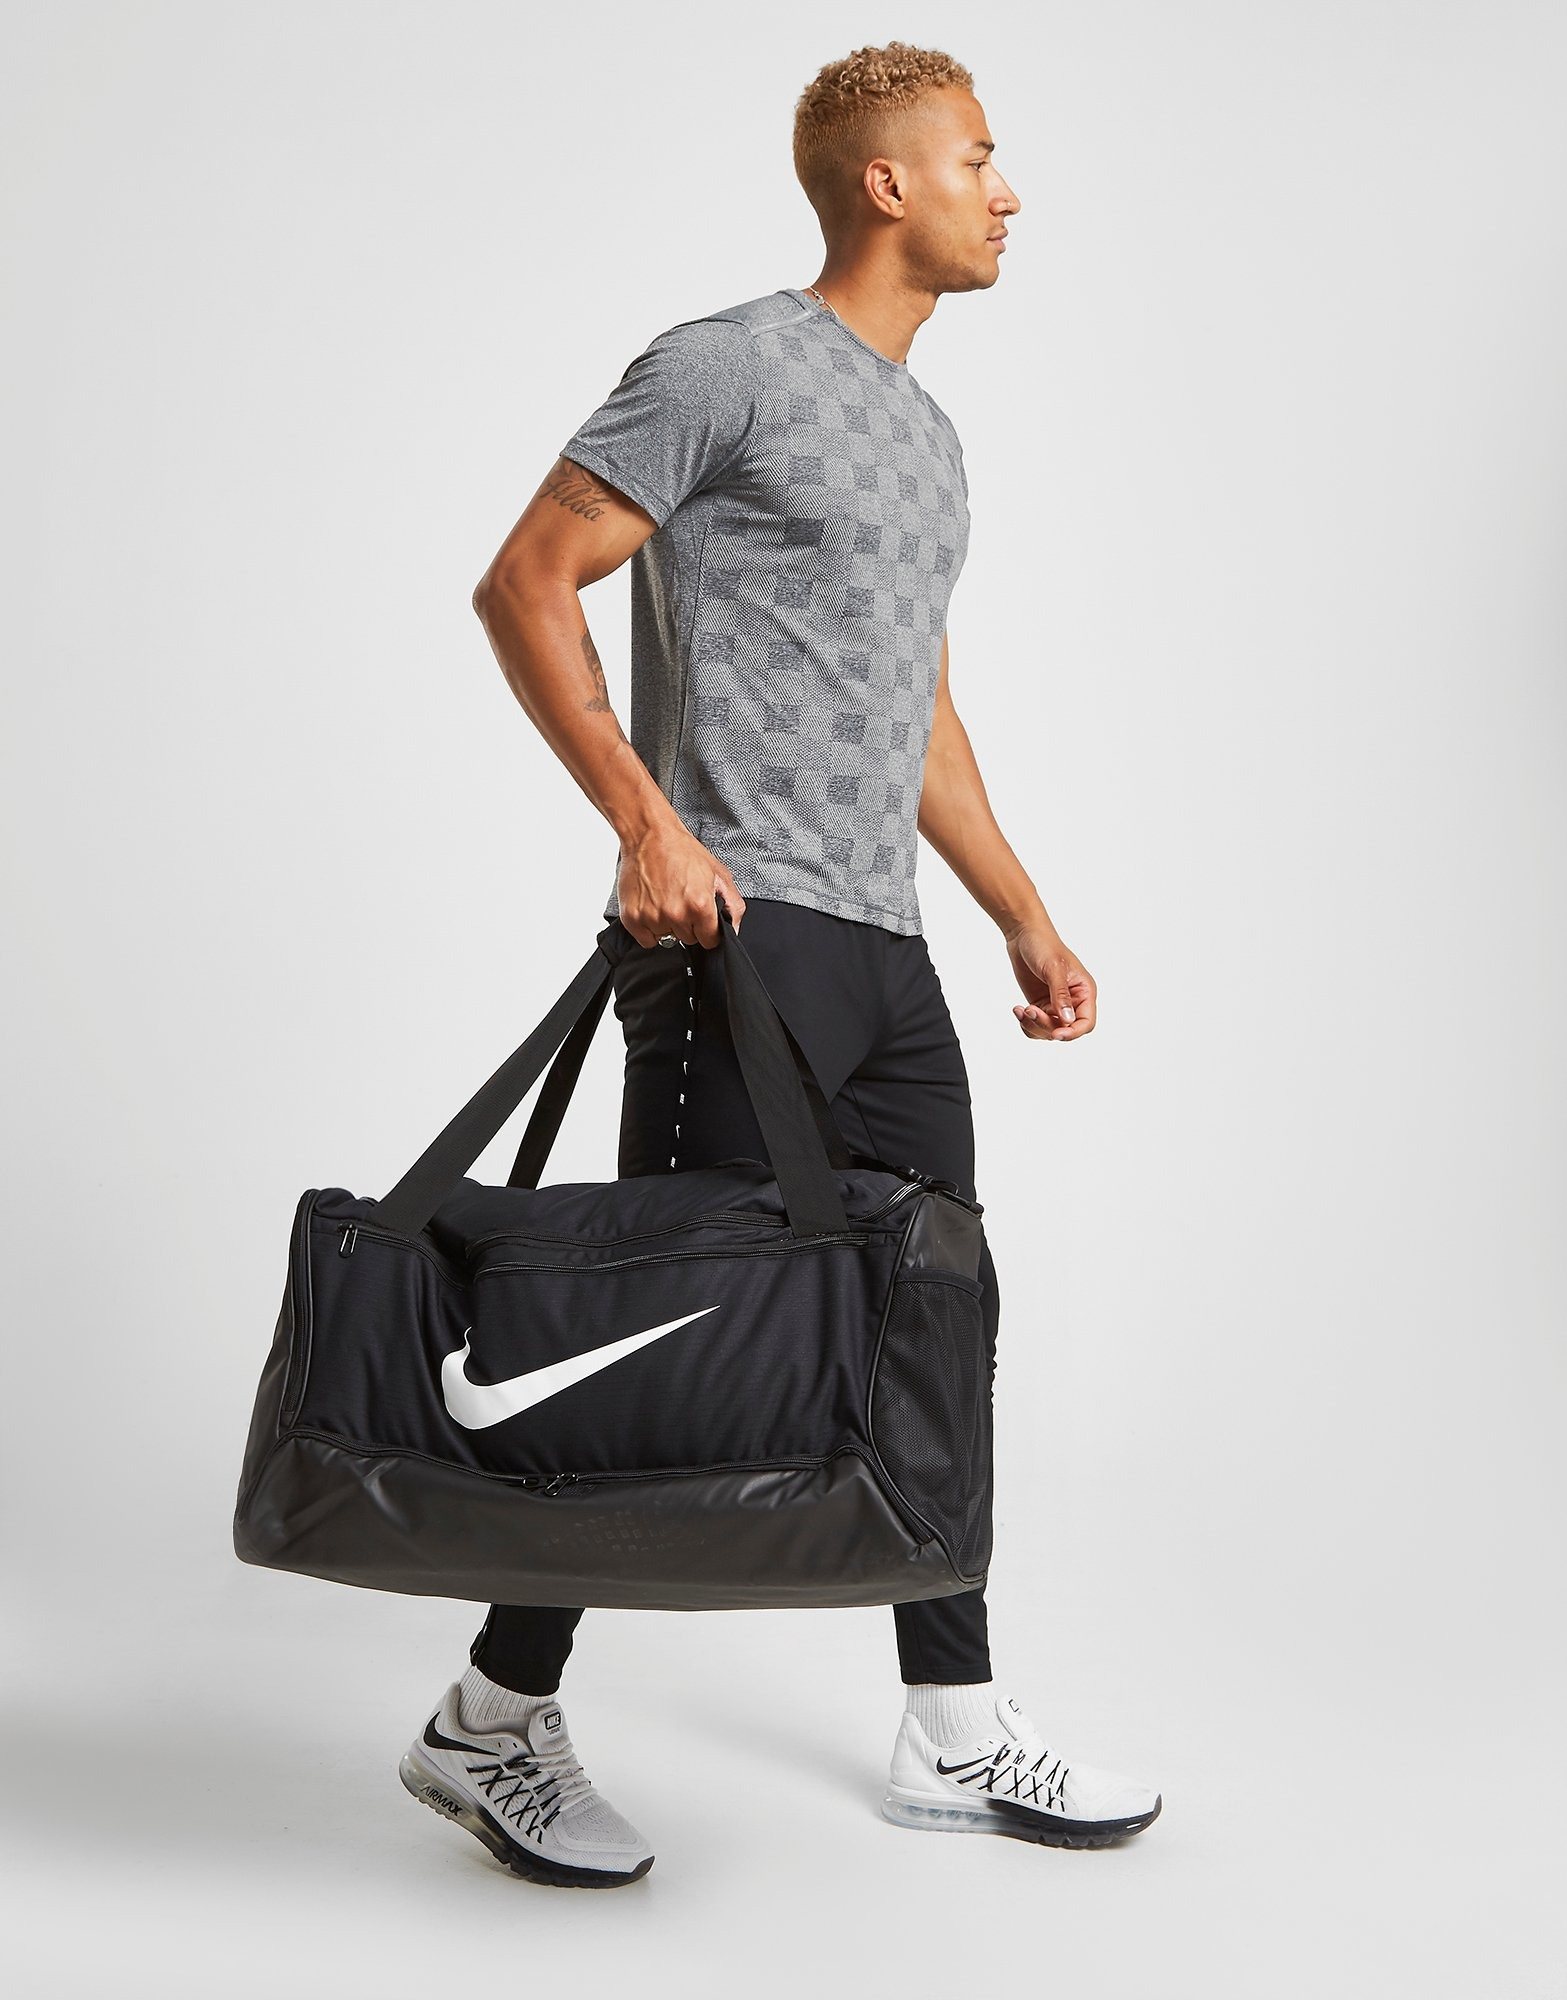 buy Nike Brasilia Duffel Sports Bag Large Black, Black